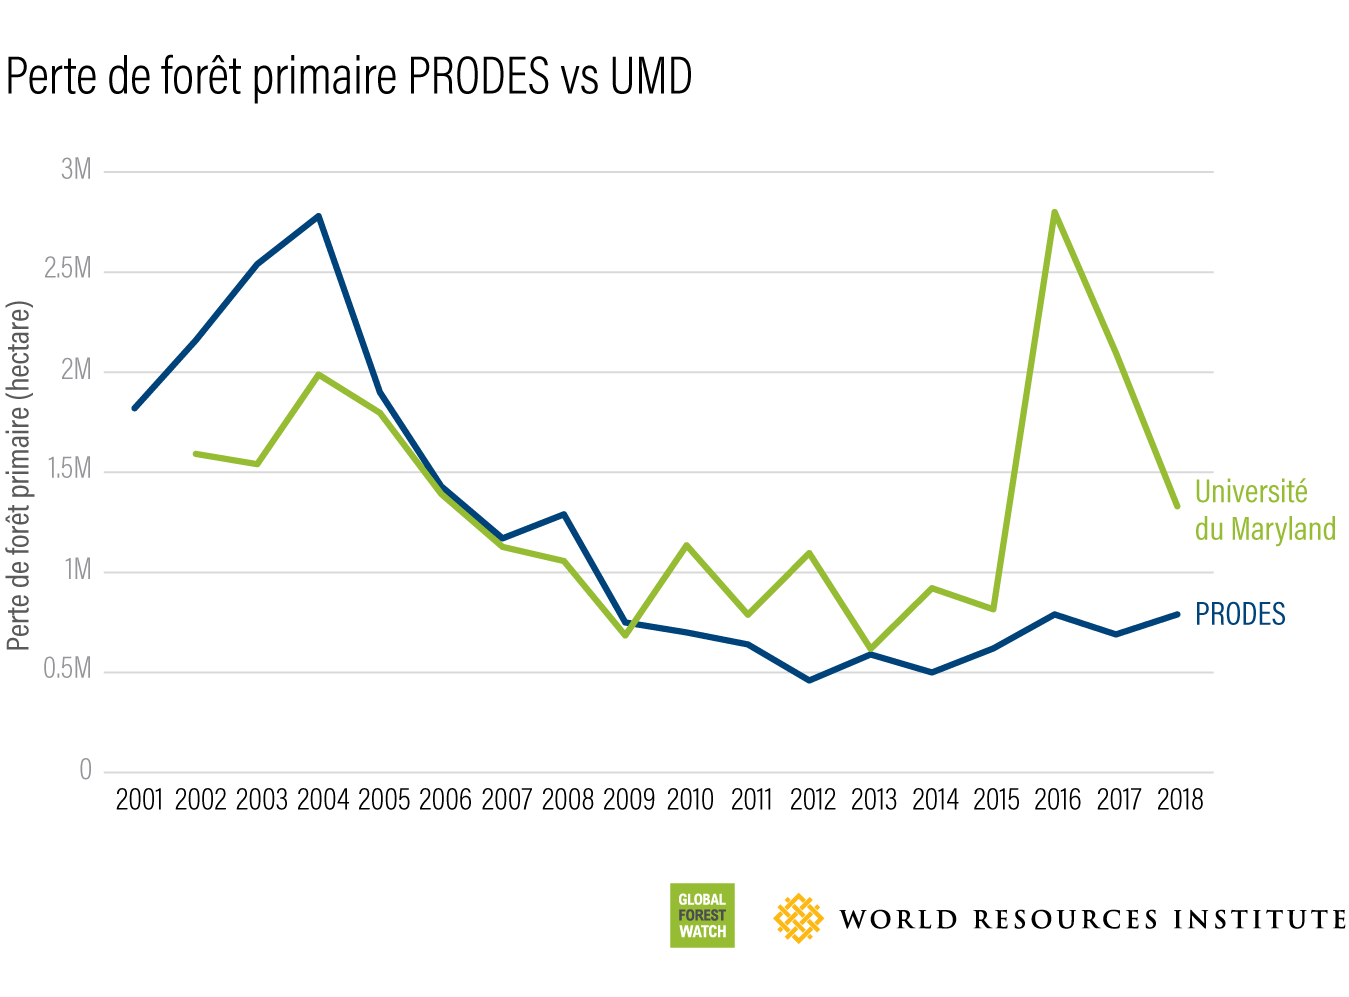 PRODES vs UMD